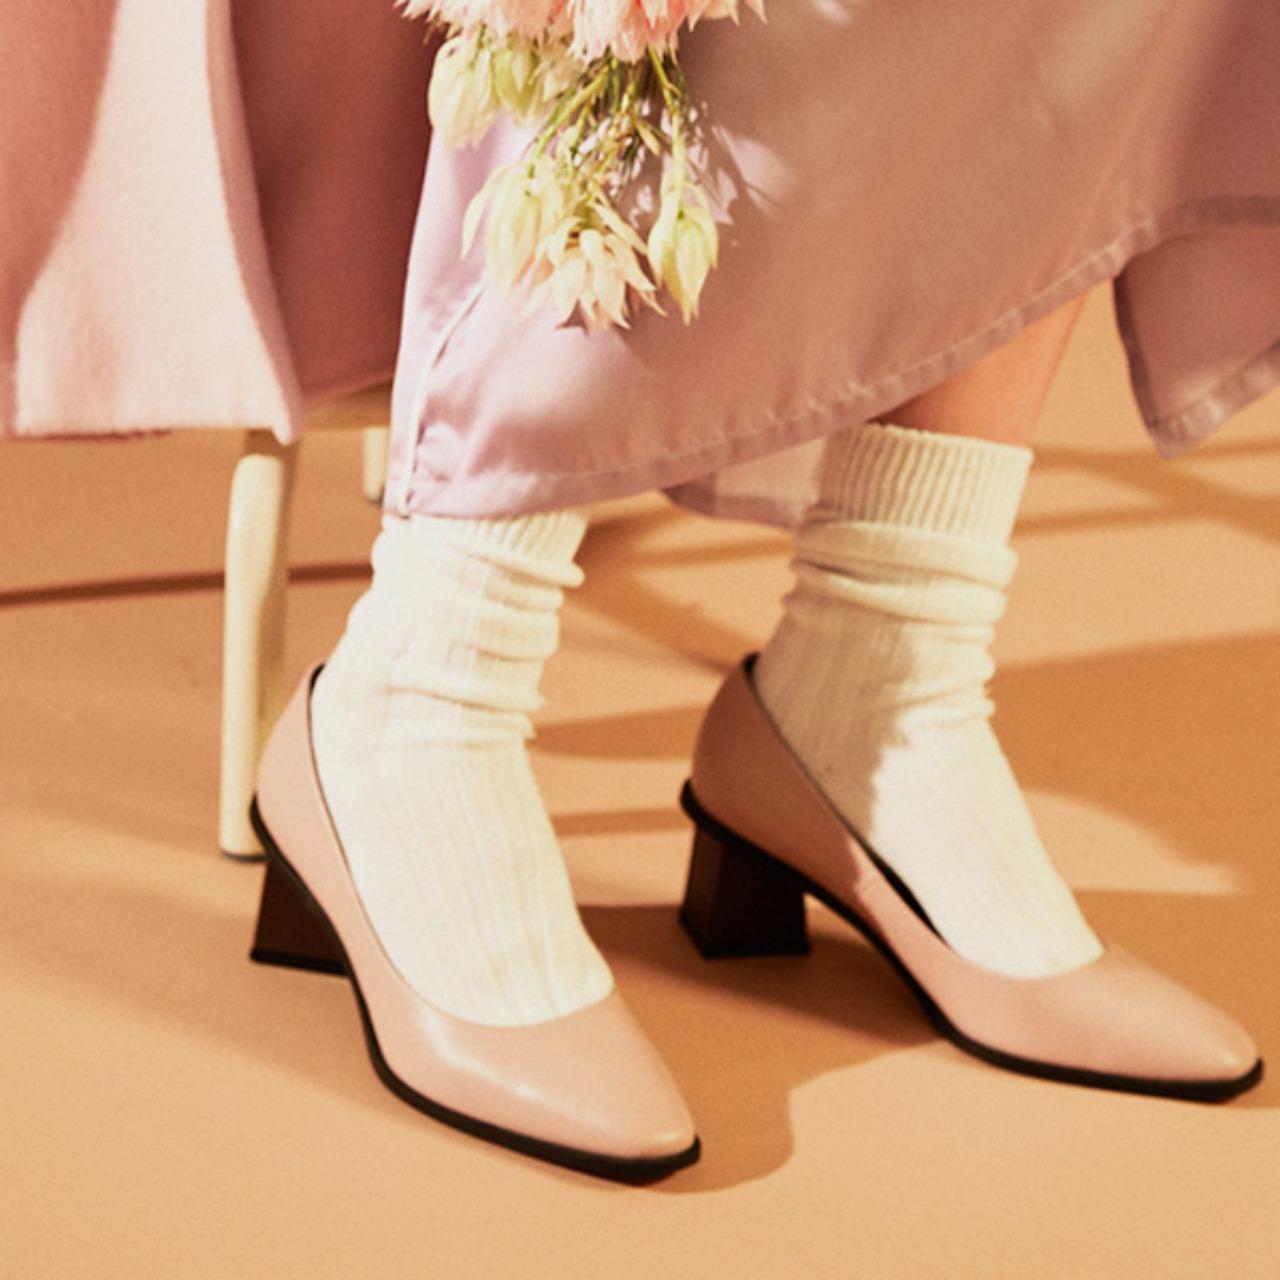 DORATORE Navona PKBR - Women's Shoes : Republic of Korea